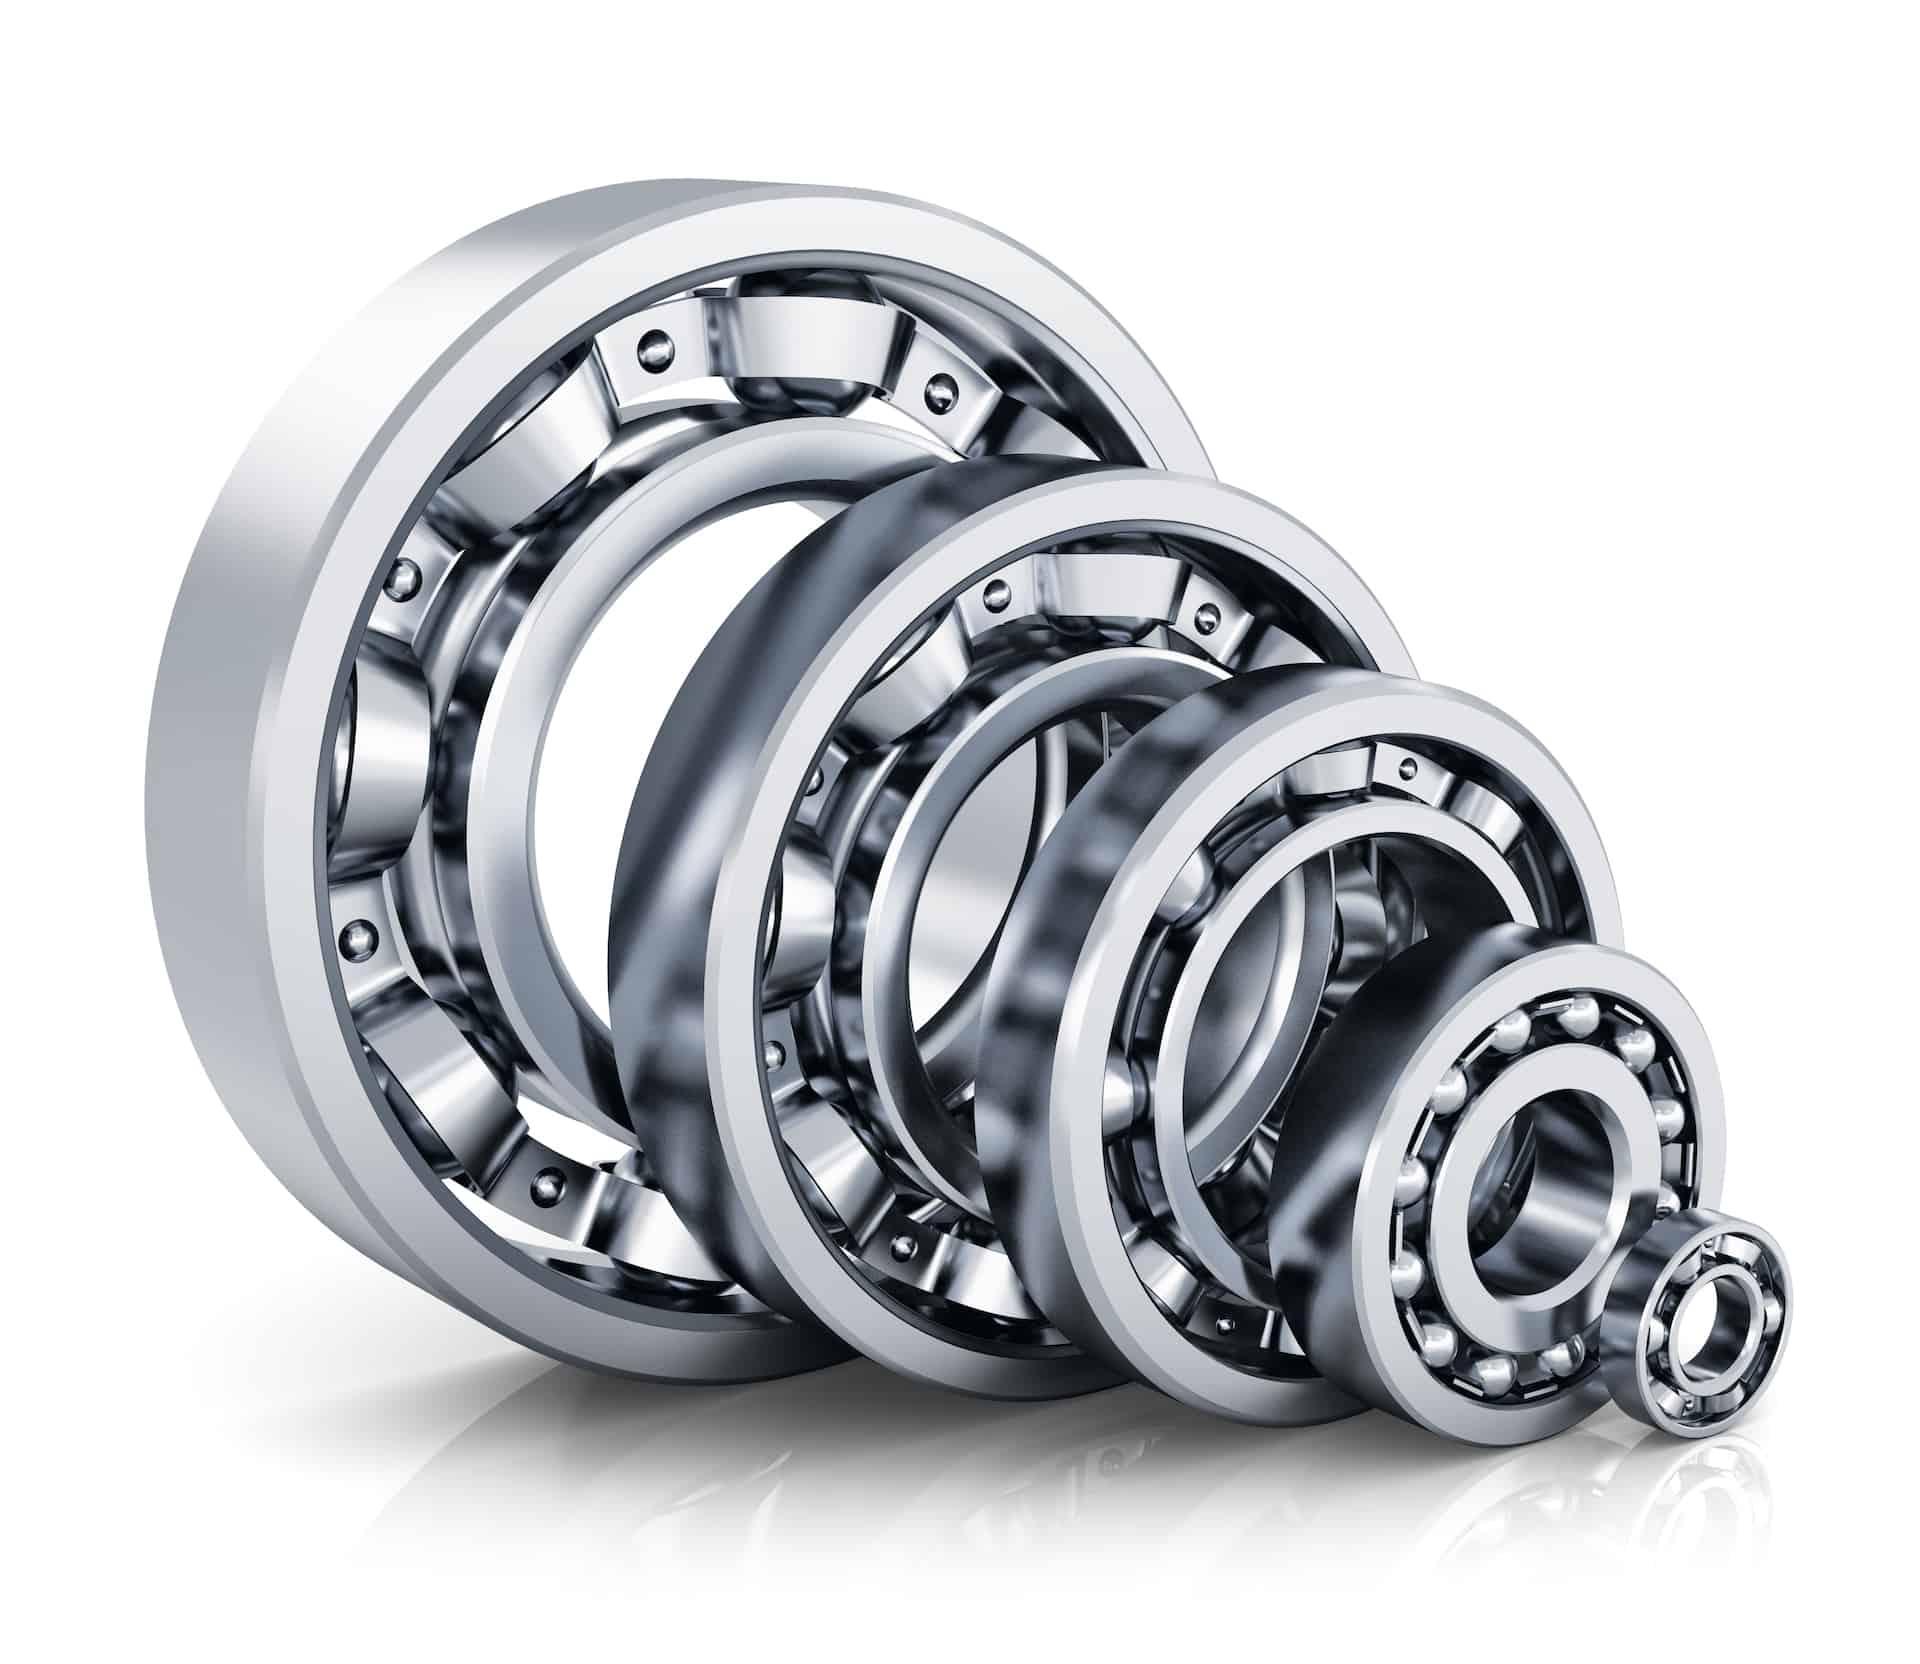 Ball Bearings Job Shop and Machine Shop Manufacturing